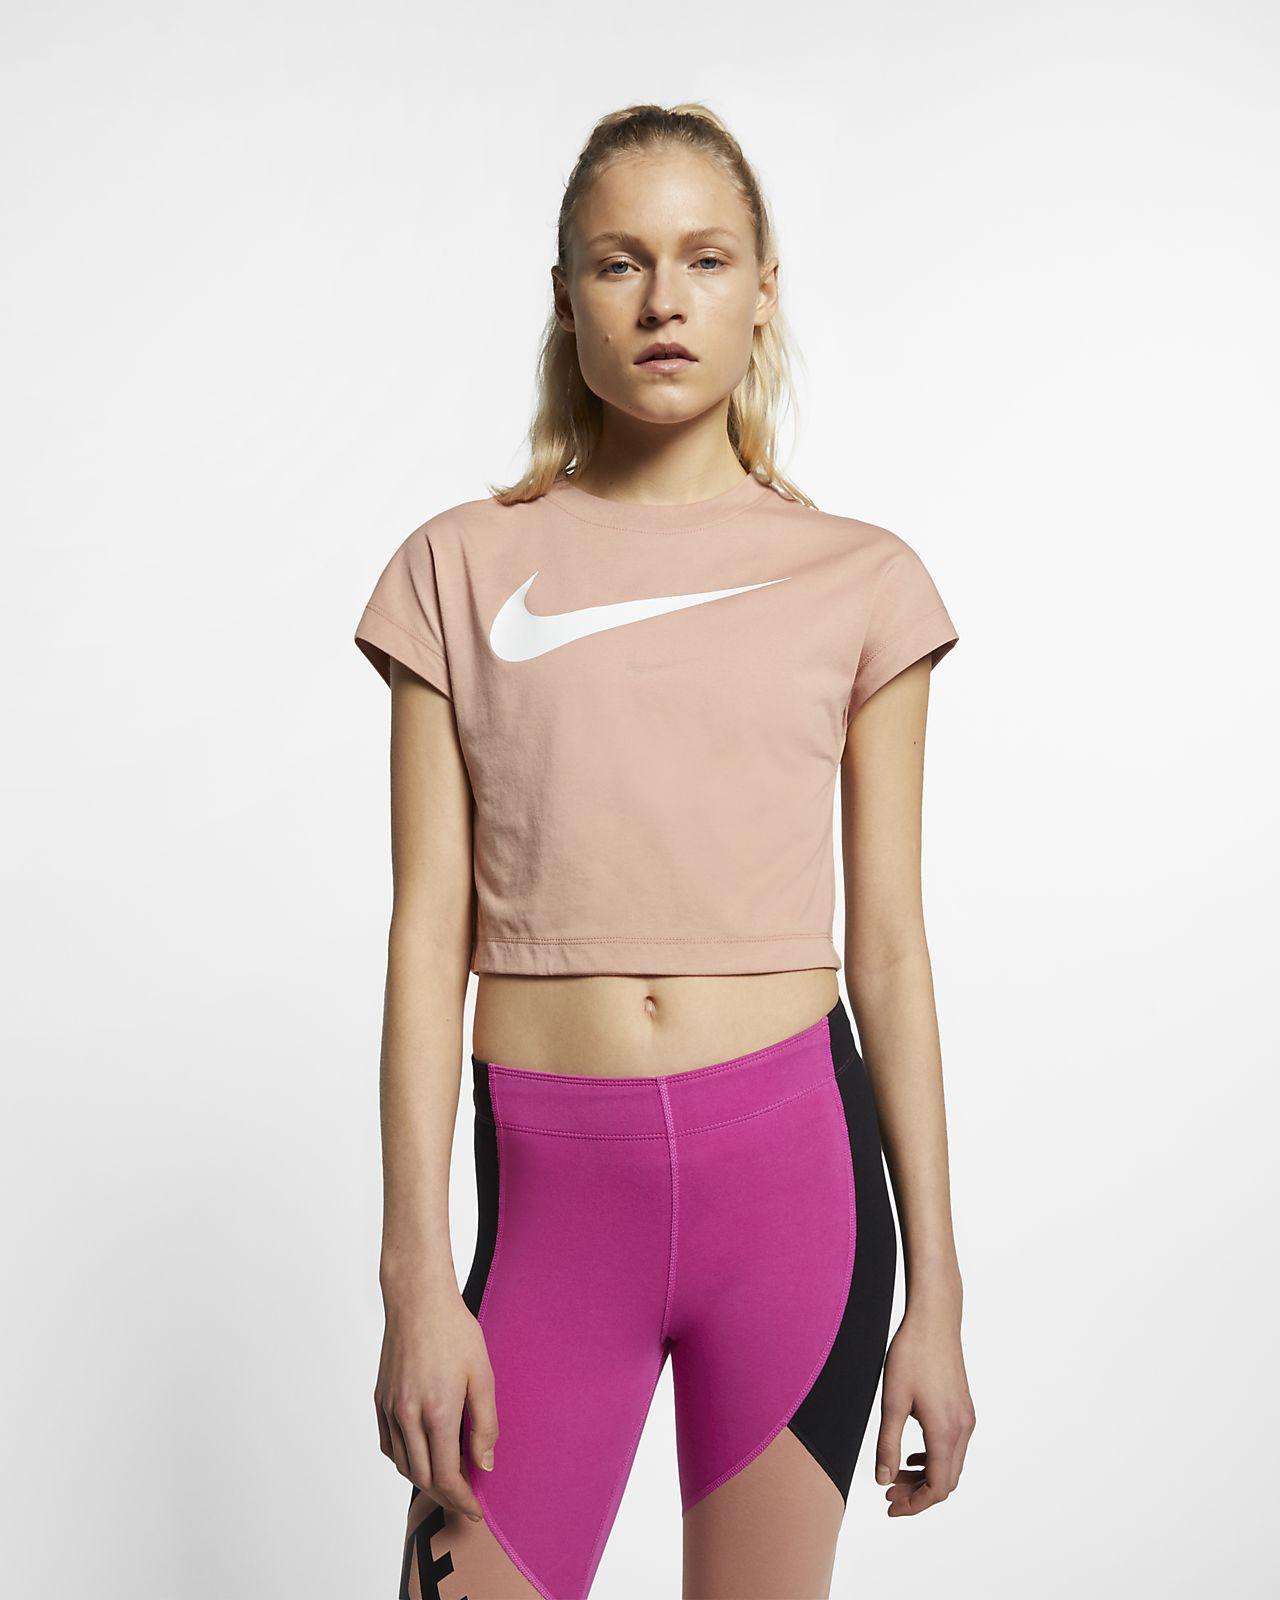 Женская укороченная футболка с коротким рукавом и логотипом Swoosh Nike Sportswear